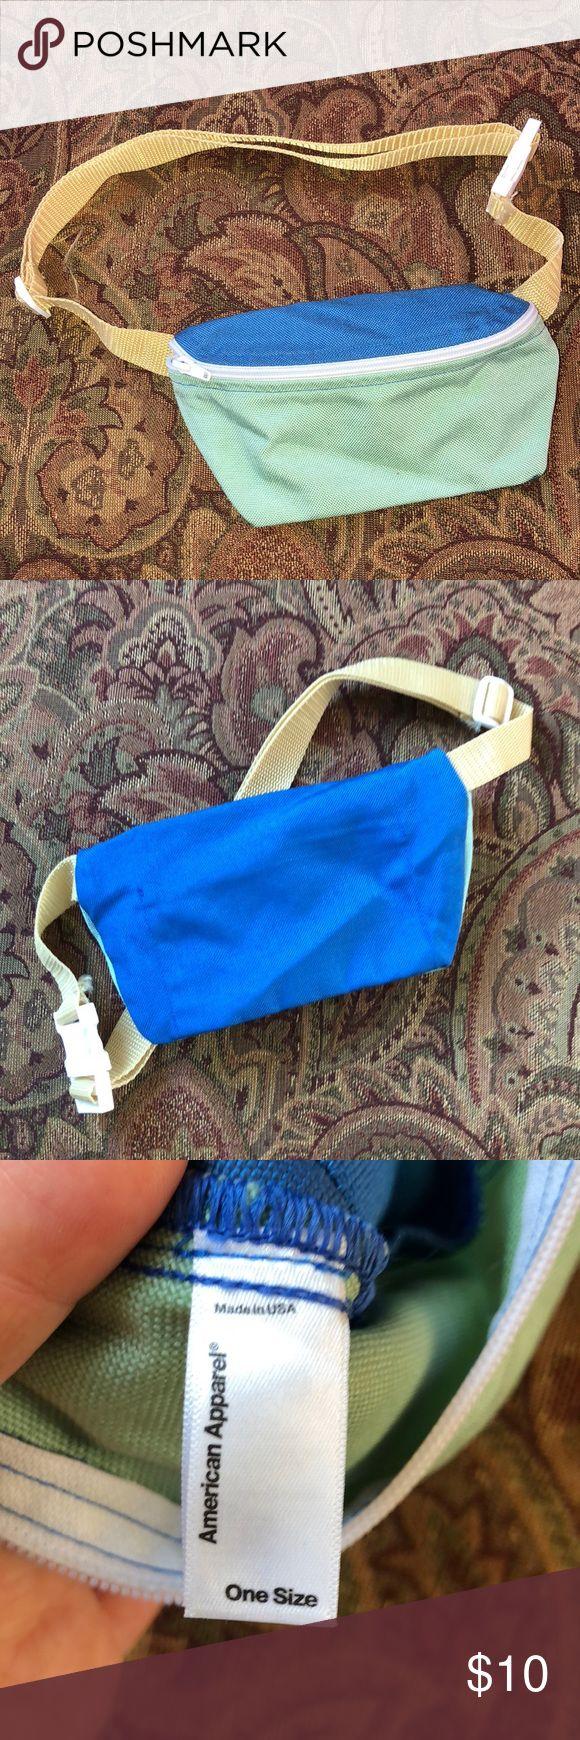 American apparel Fannie pack Like new American Apparel Bags